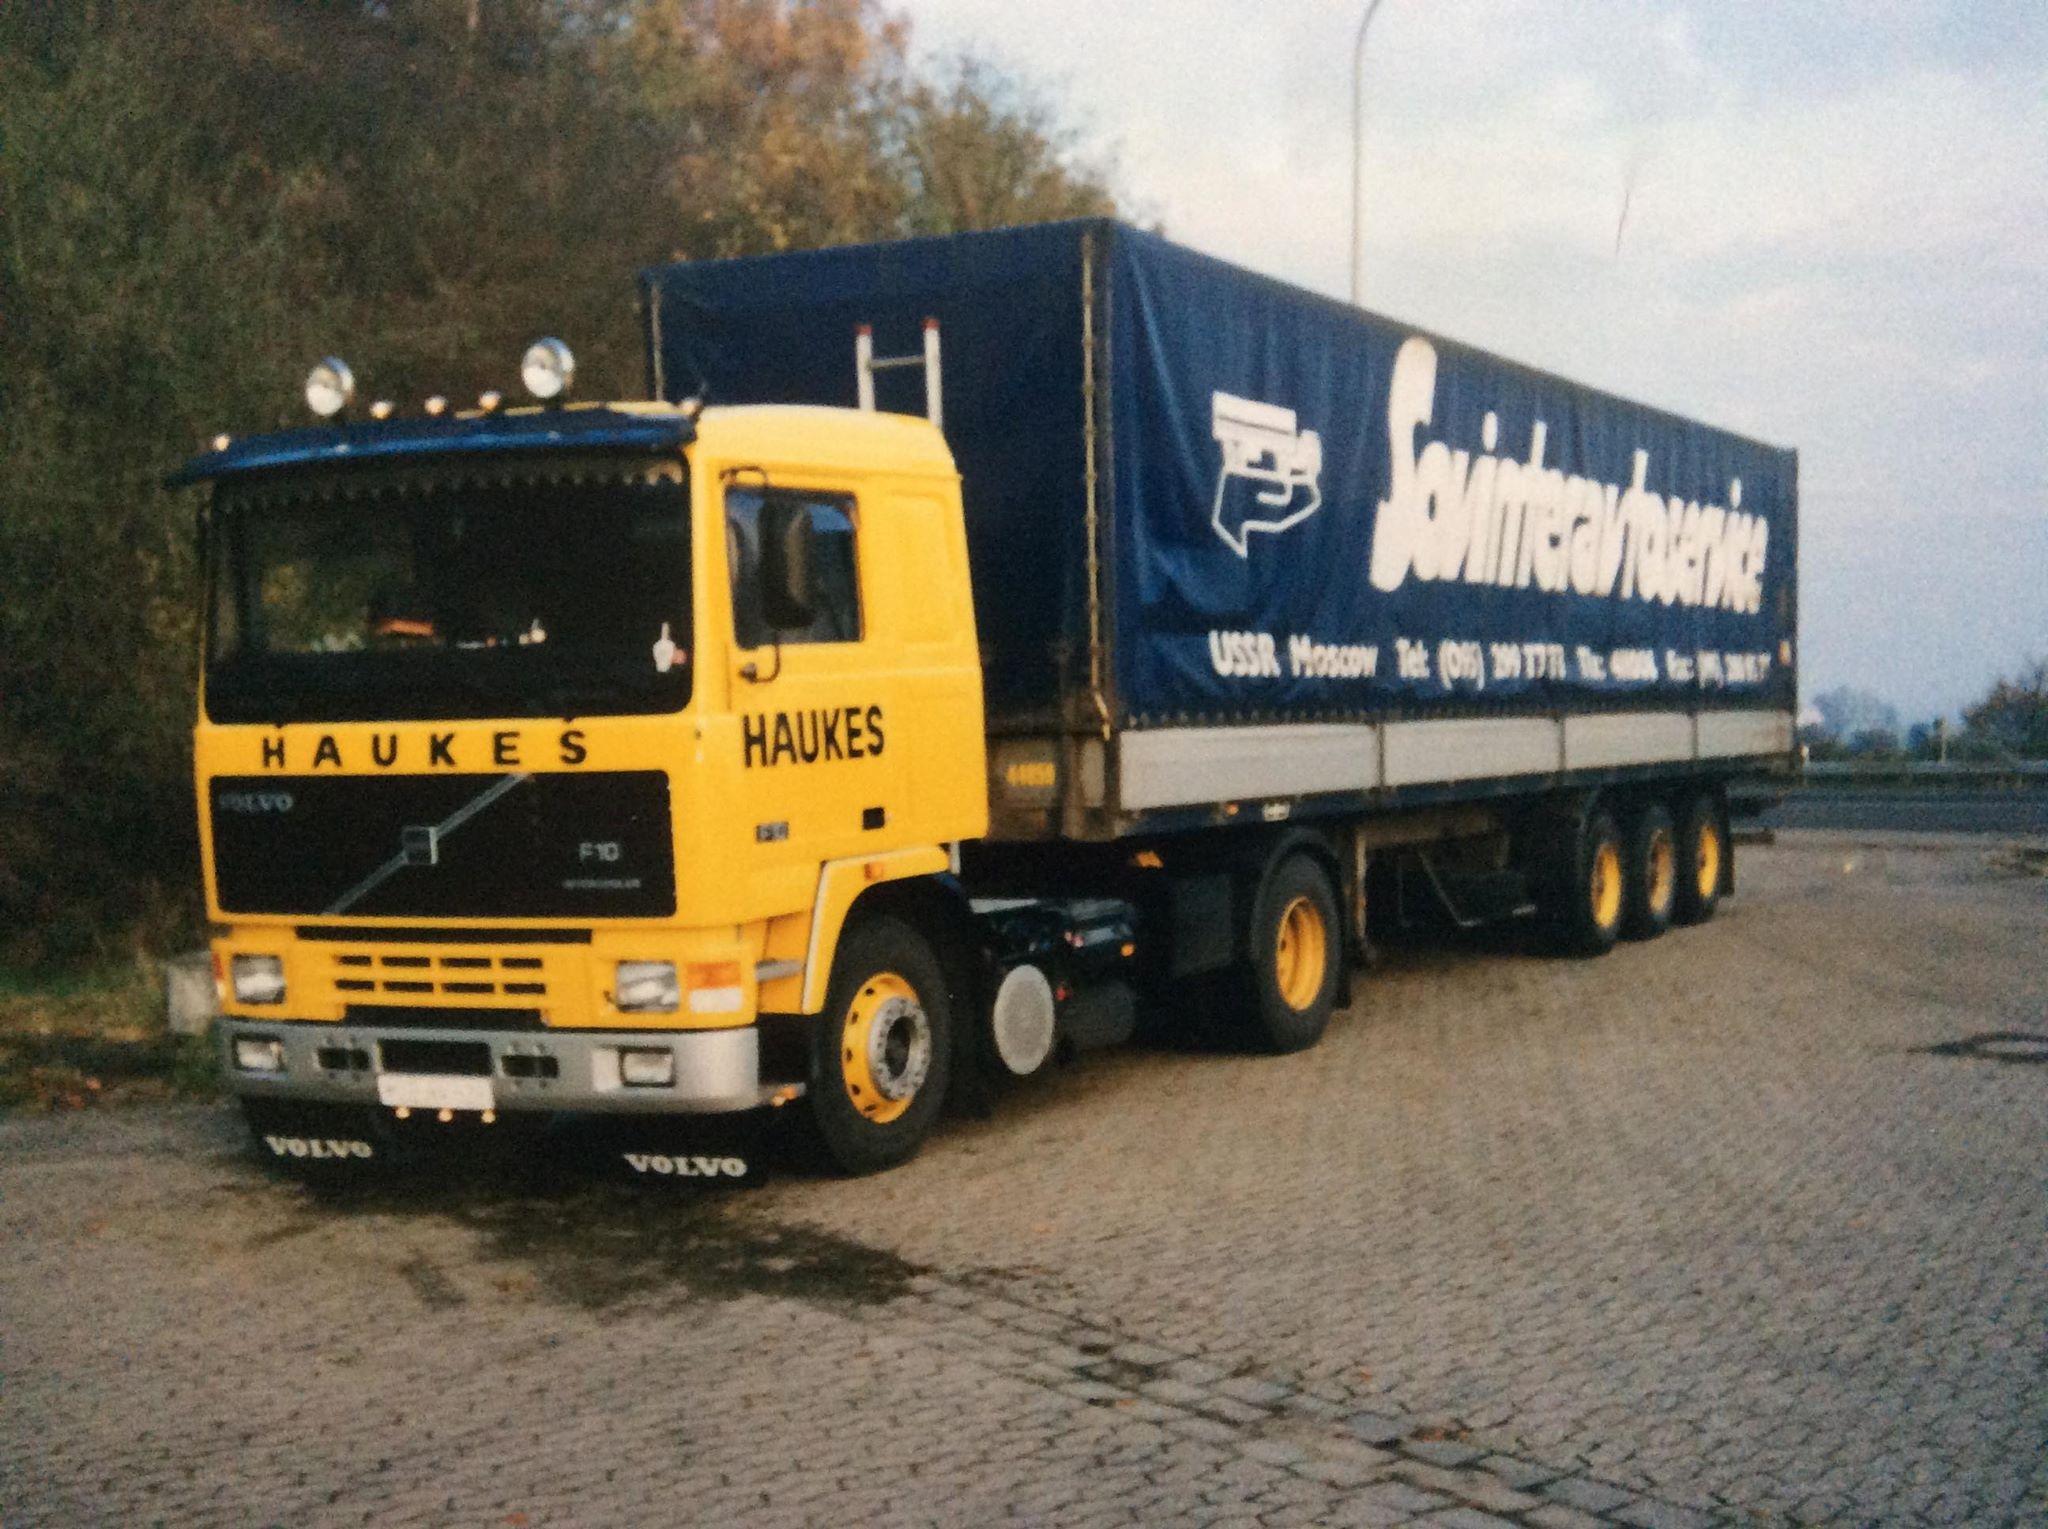 Volvo-Henk-Schmitjes-foto-archief-23